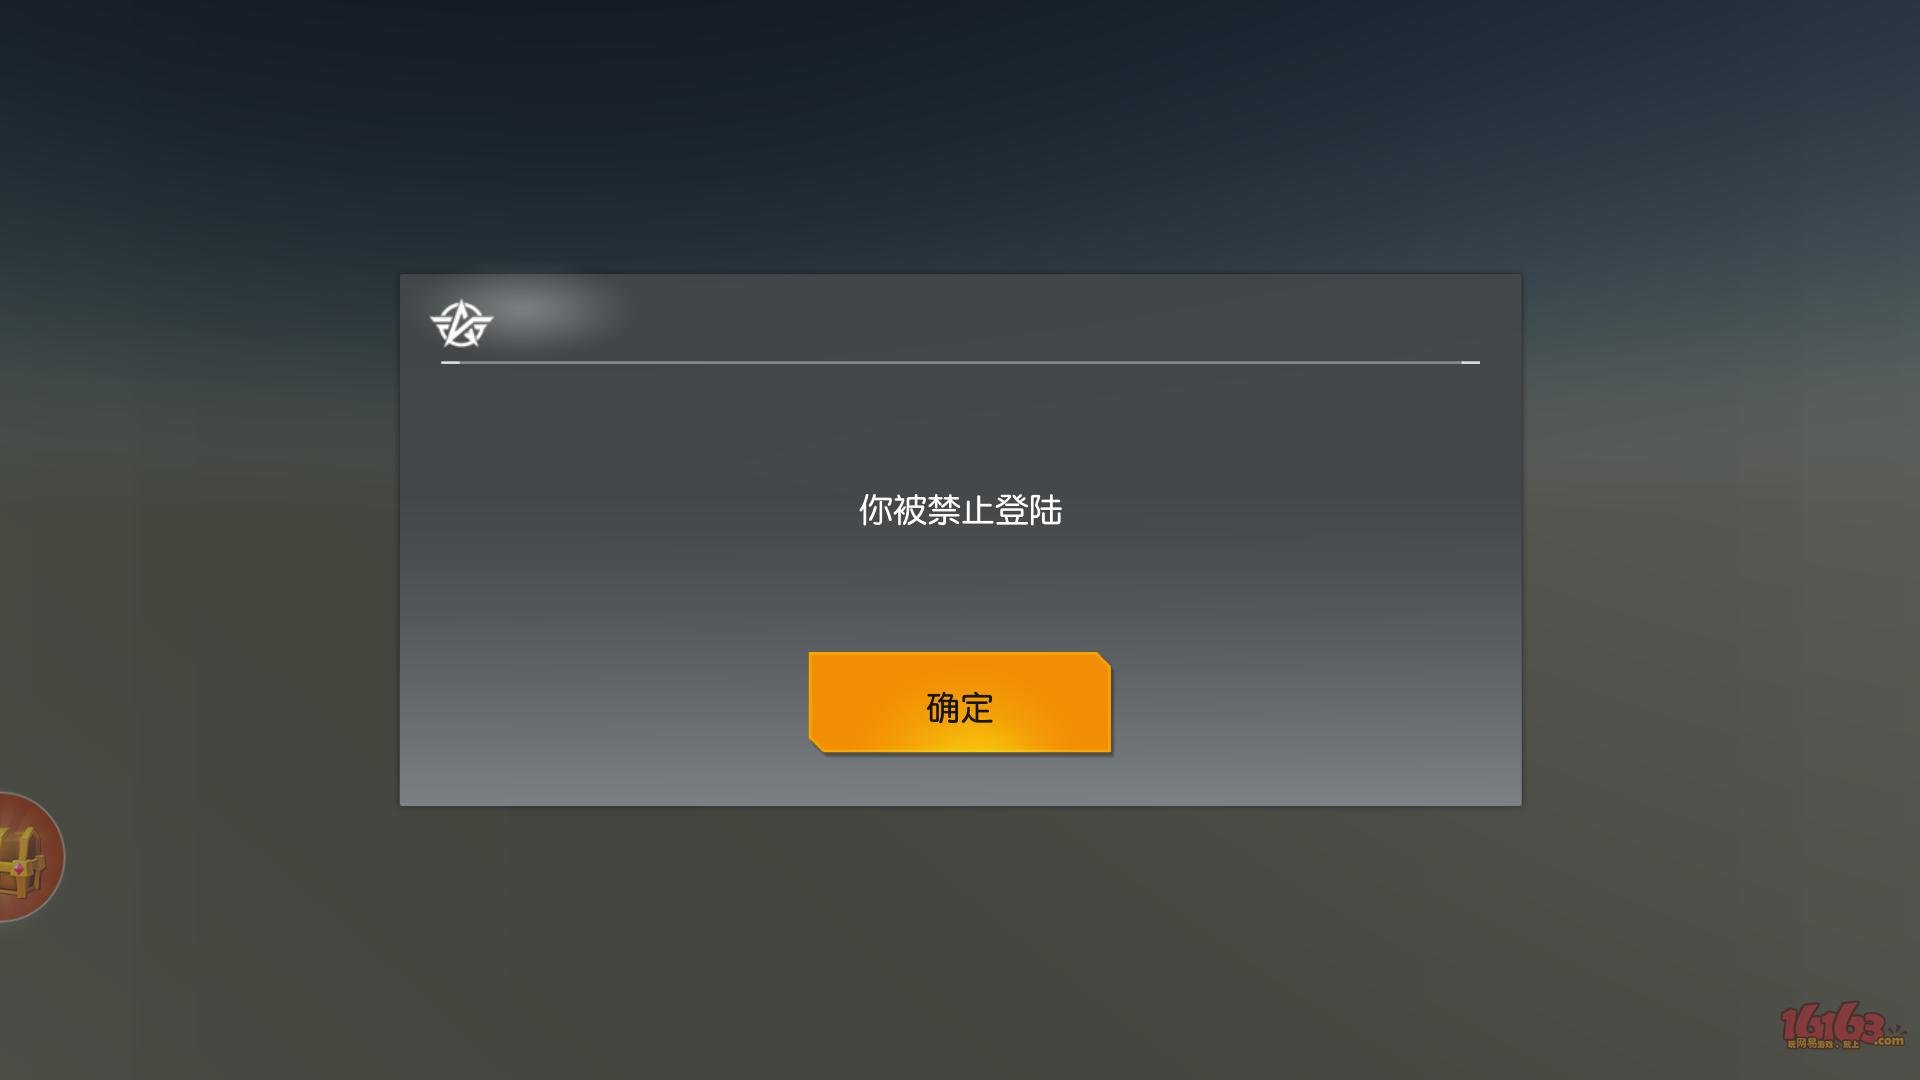 Screenshot_2018-02-06-11-00-33-710_com.netease.hyxd.mi.png